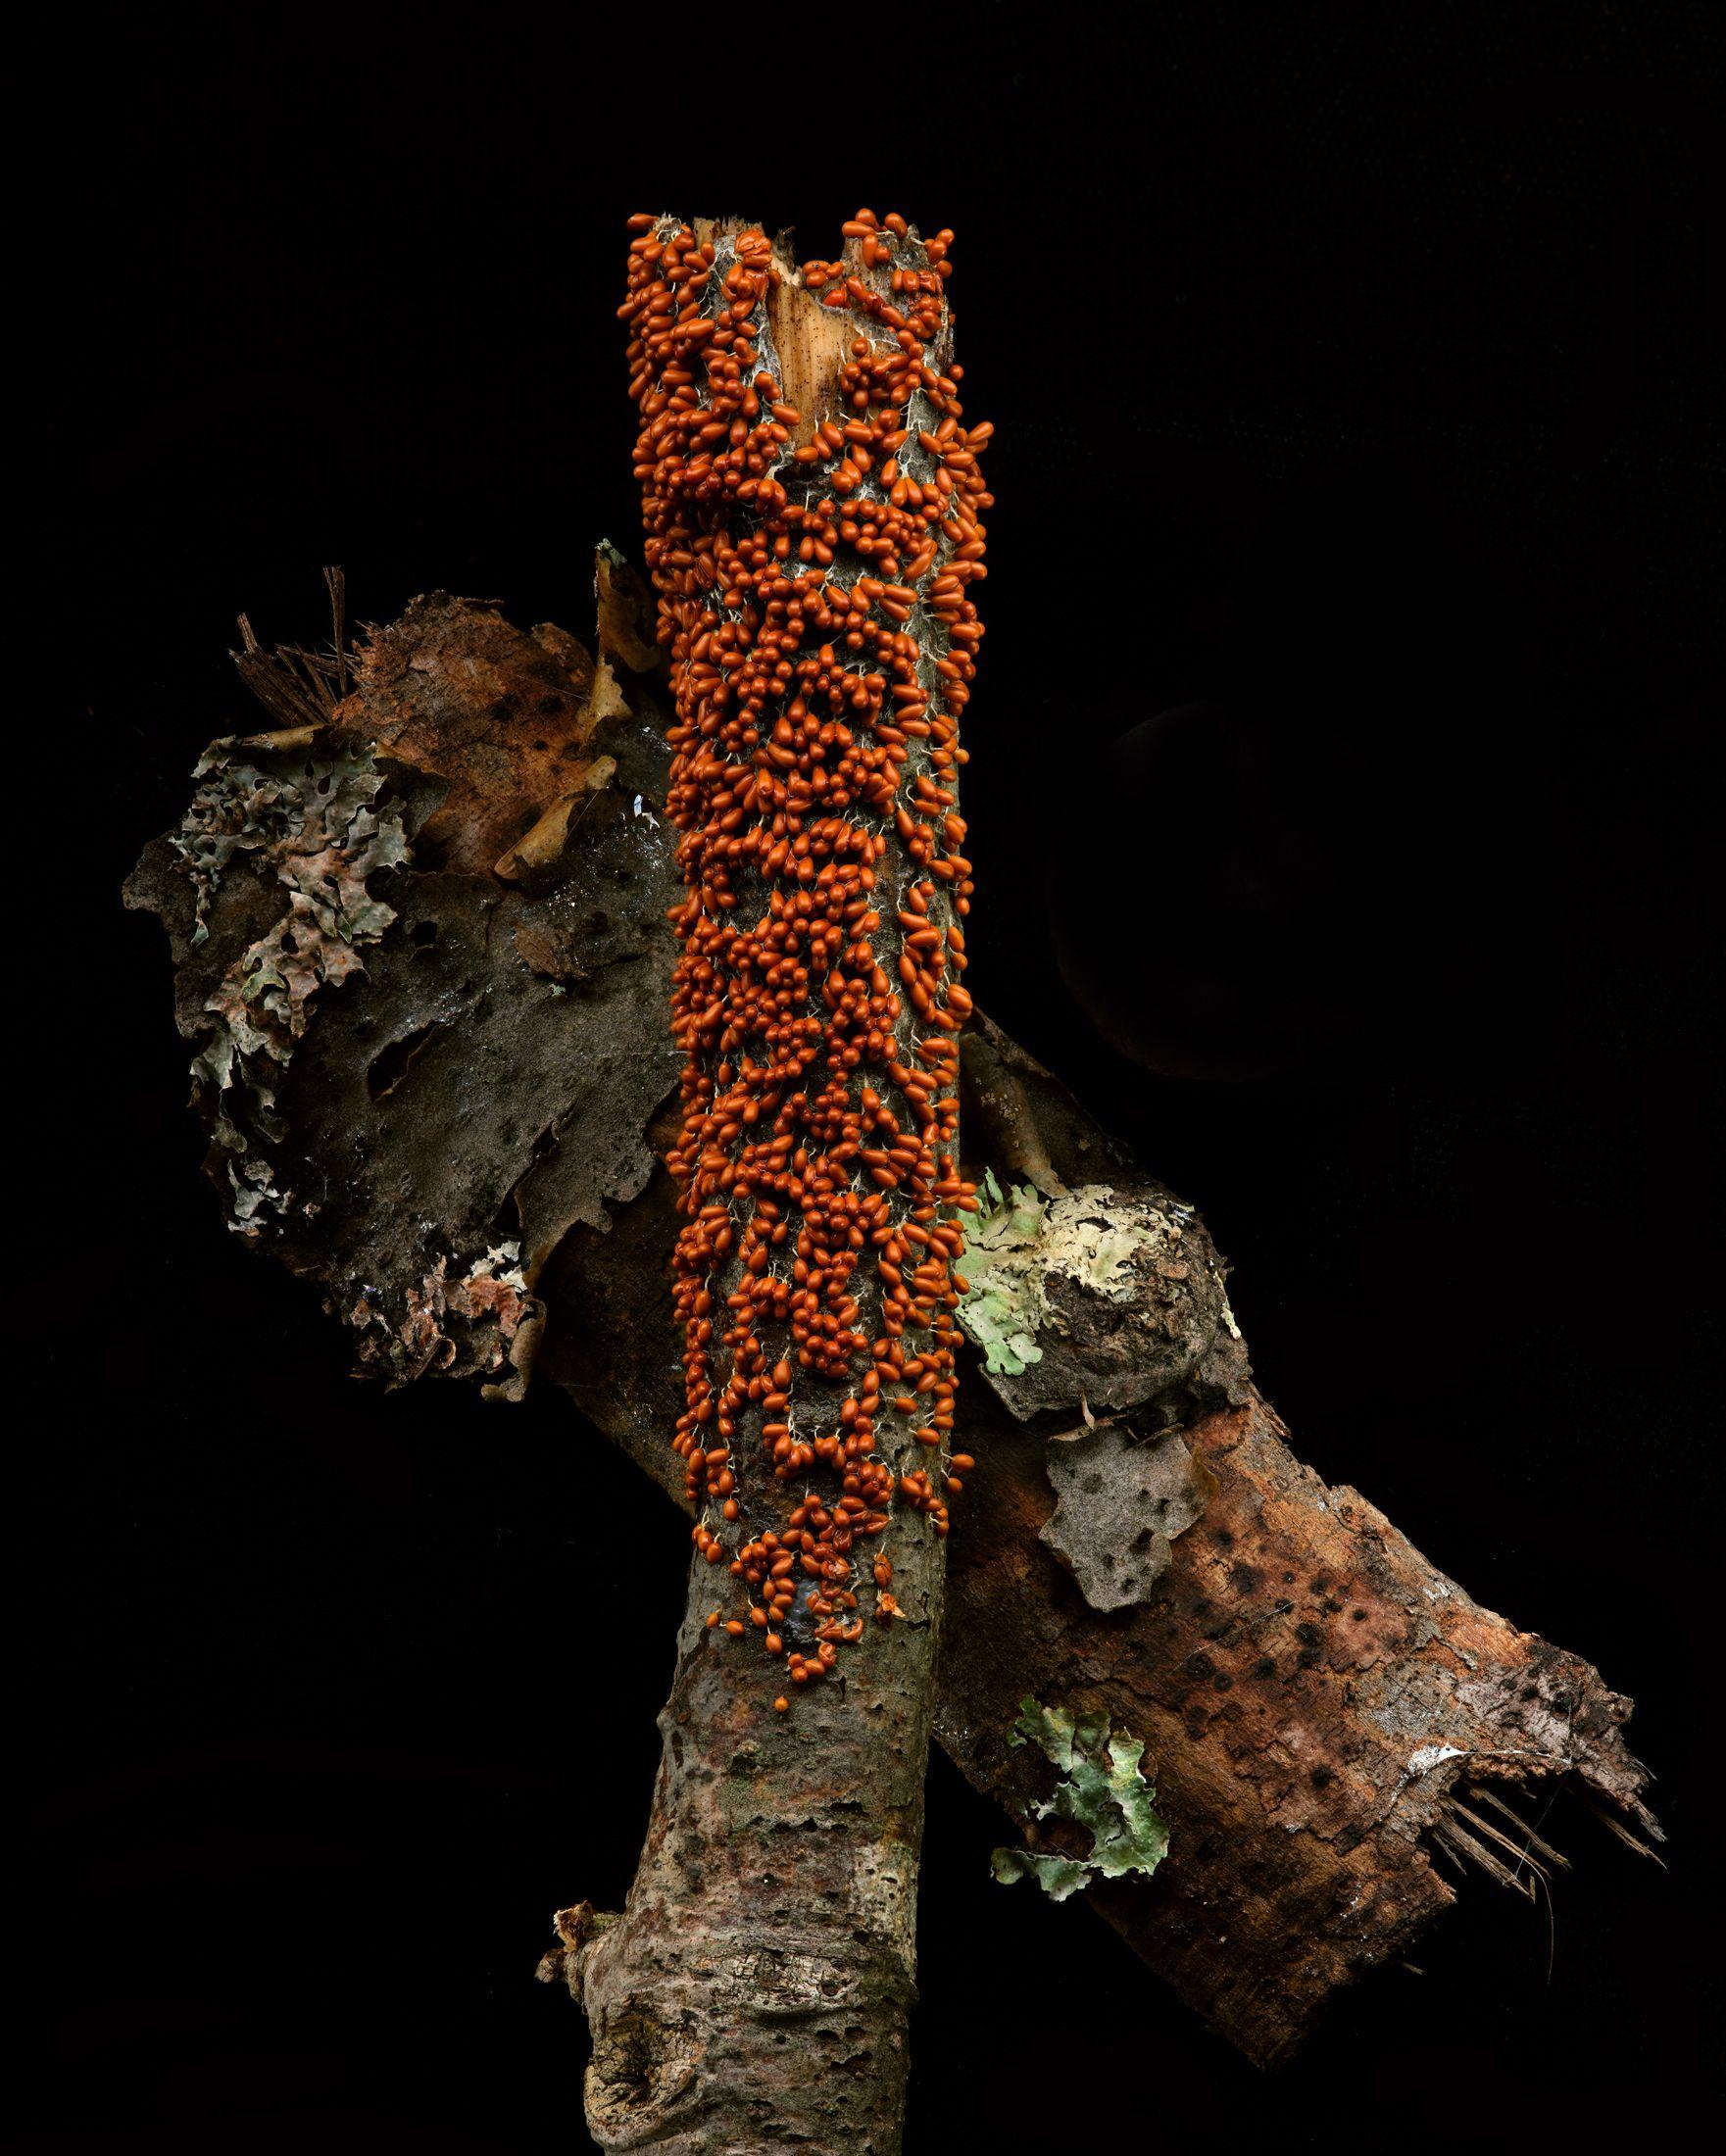 13 348-354-Leocarpus-fragilis--Insect-egg-mass-slime.jpg